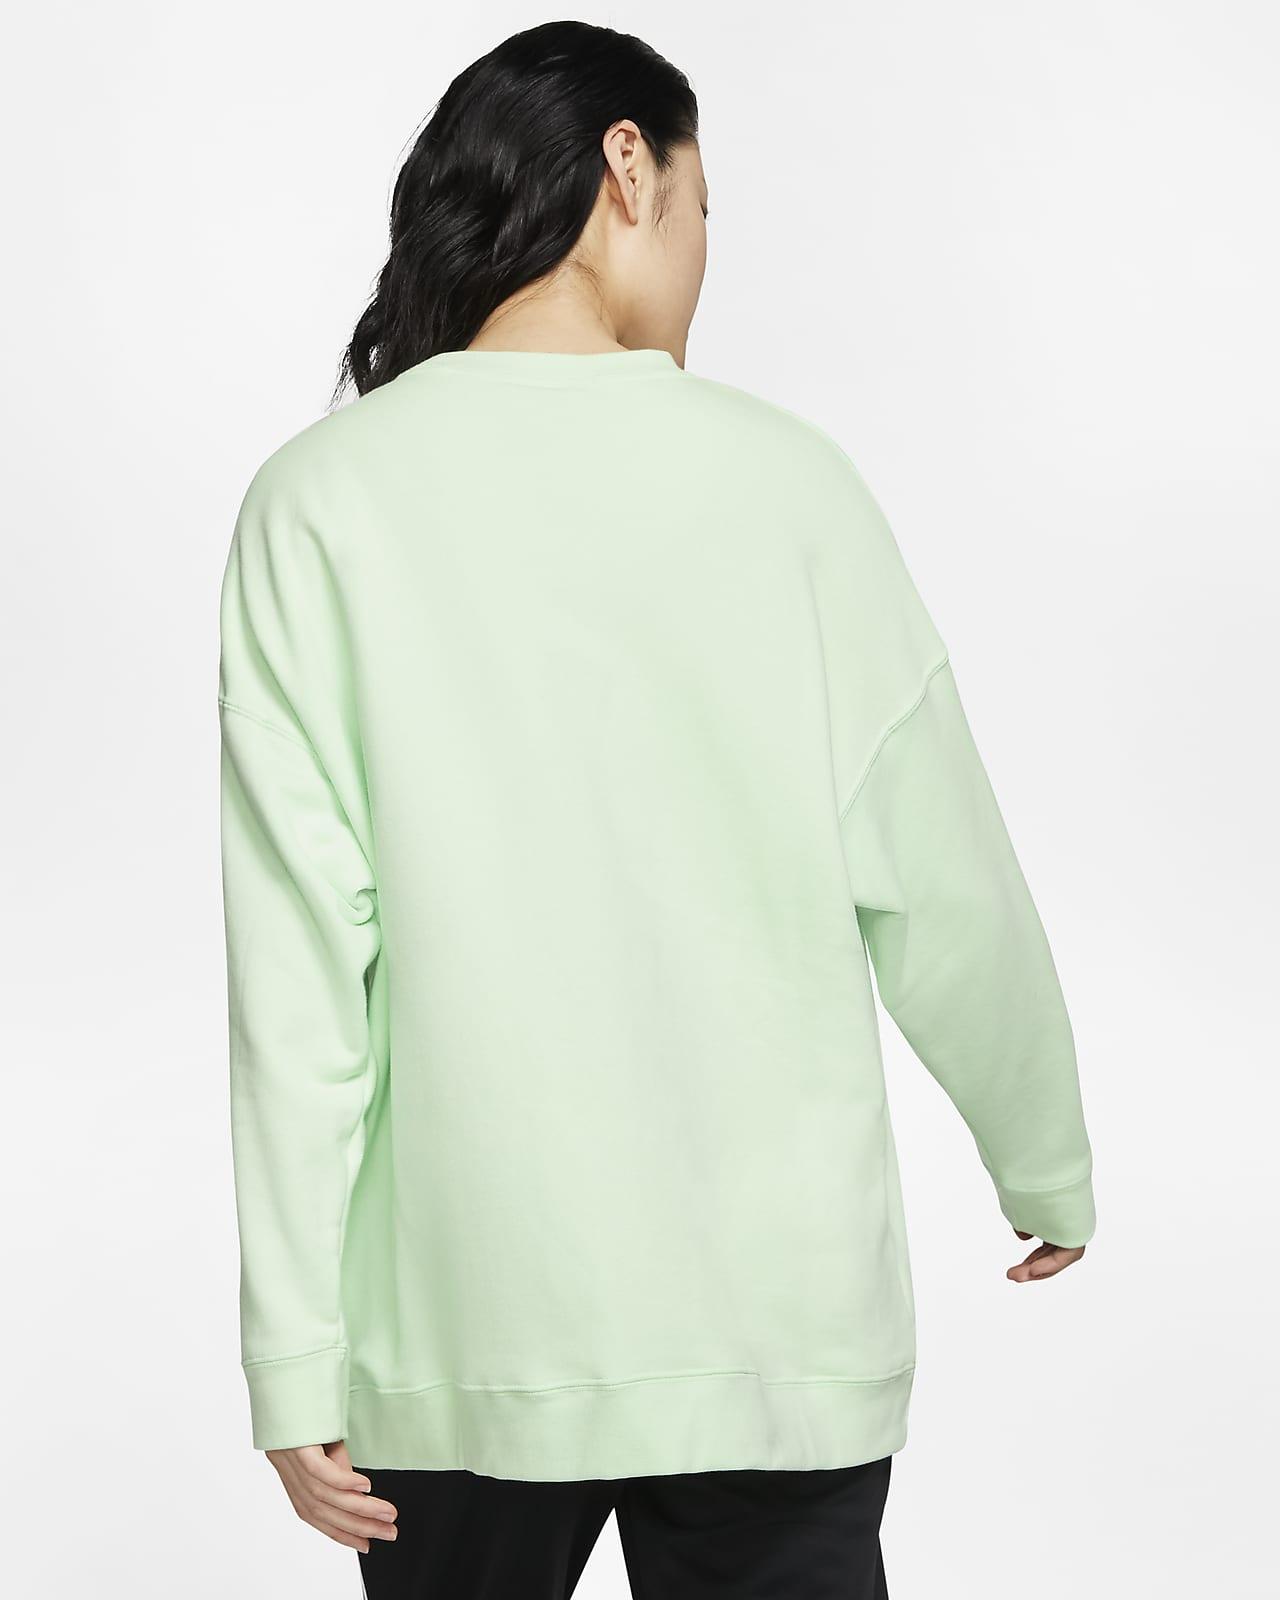 Sports Outdoors Sweatshirts Hoodies Nike Womens Sportswear Tech Fleece Crew Shirt Blue Green